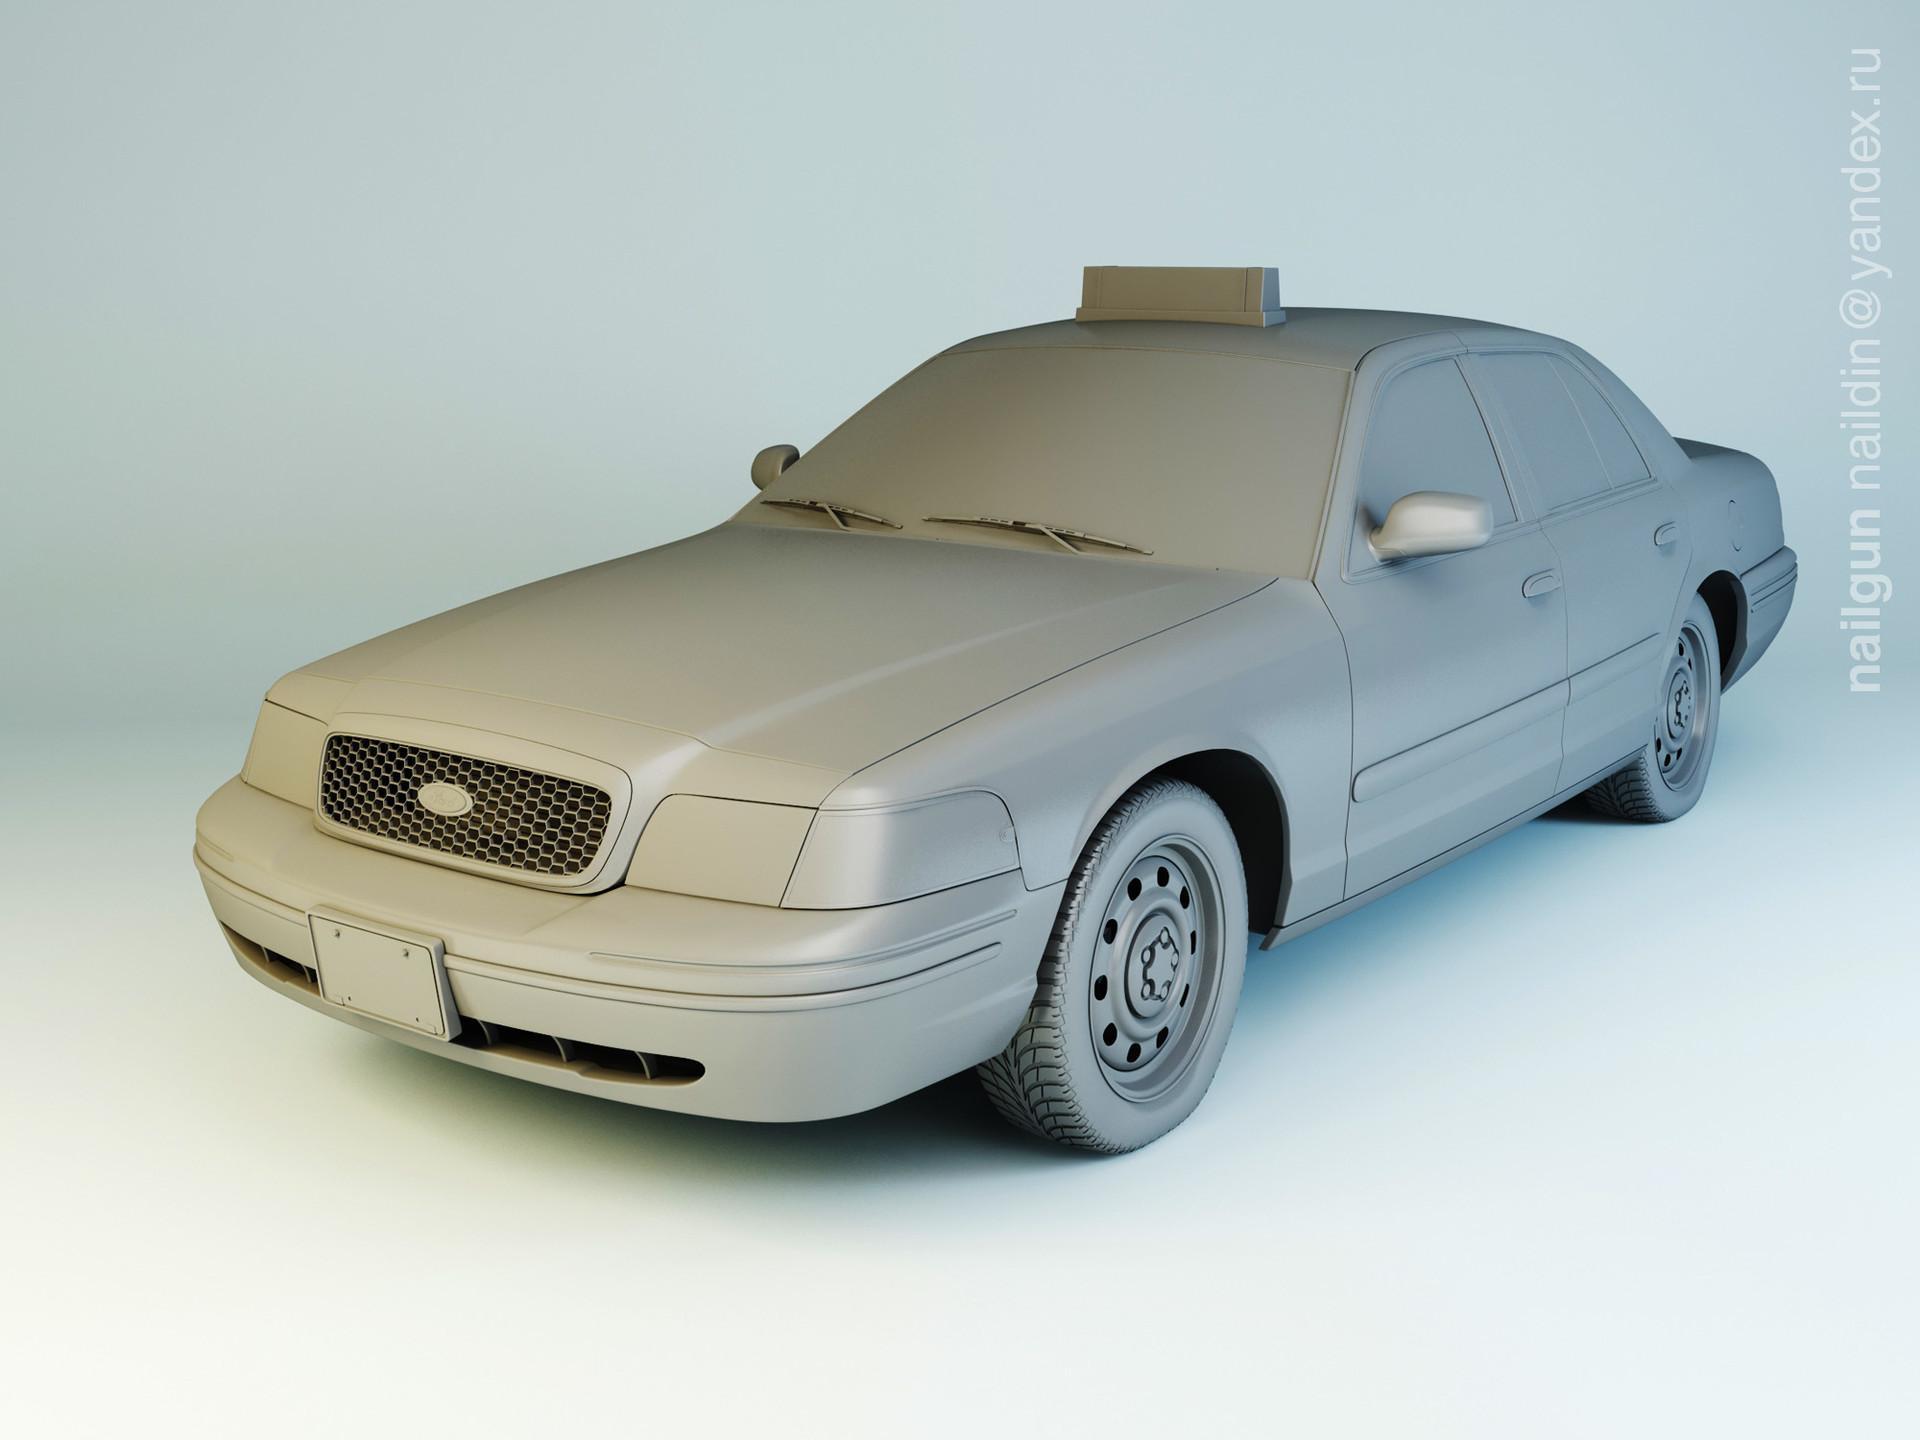 Nail khusnutdinov 003 ford cv modelling